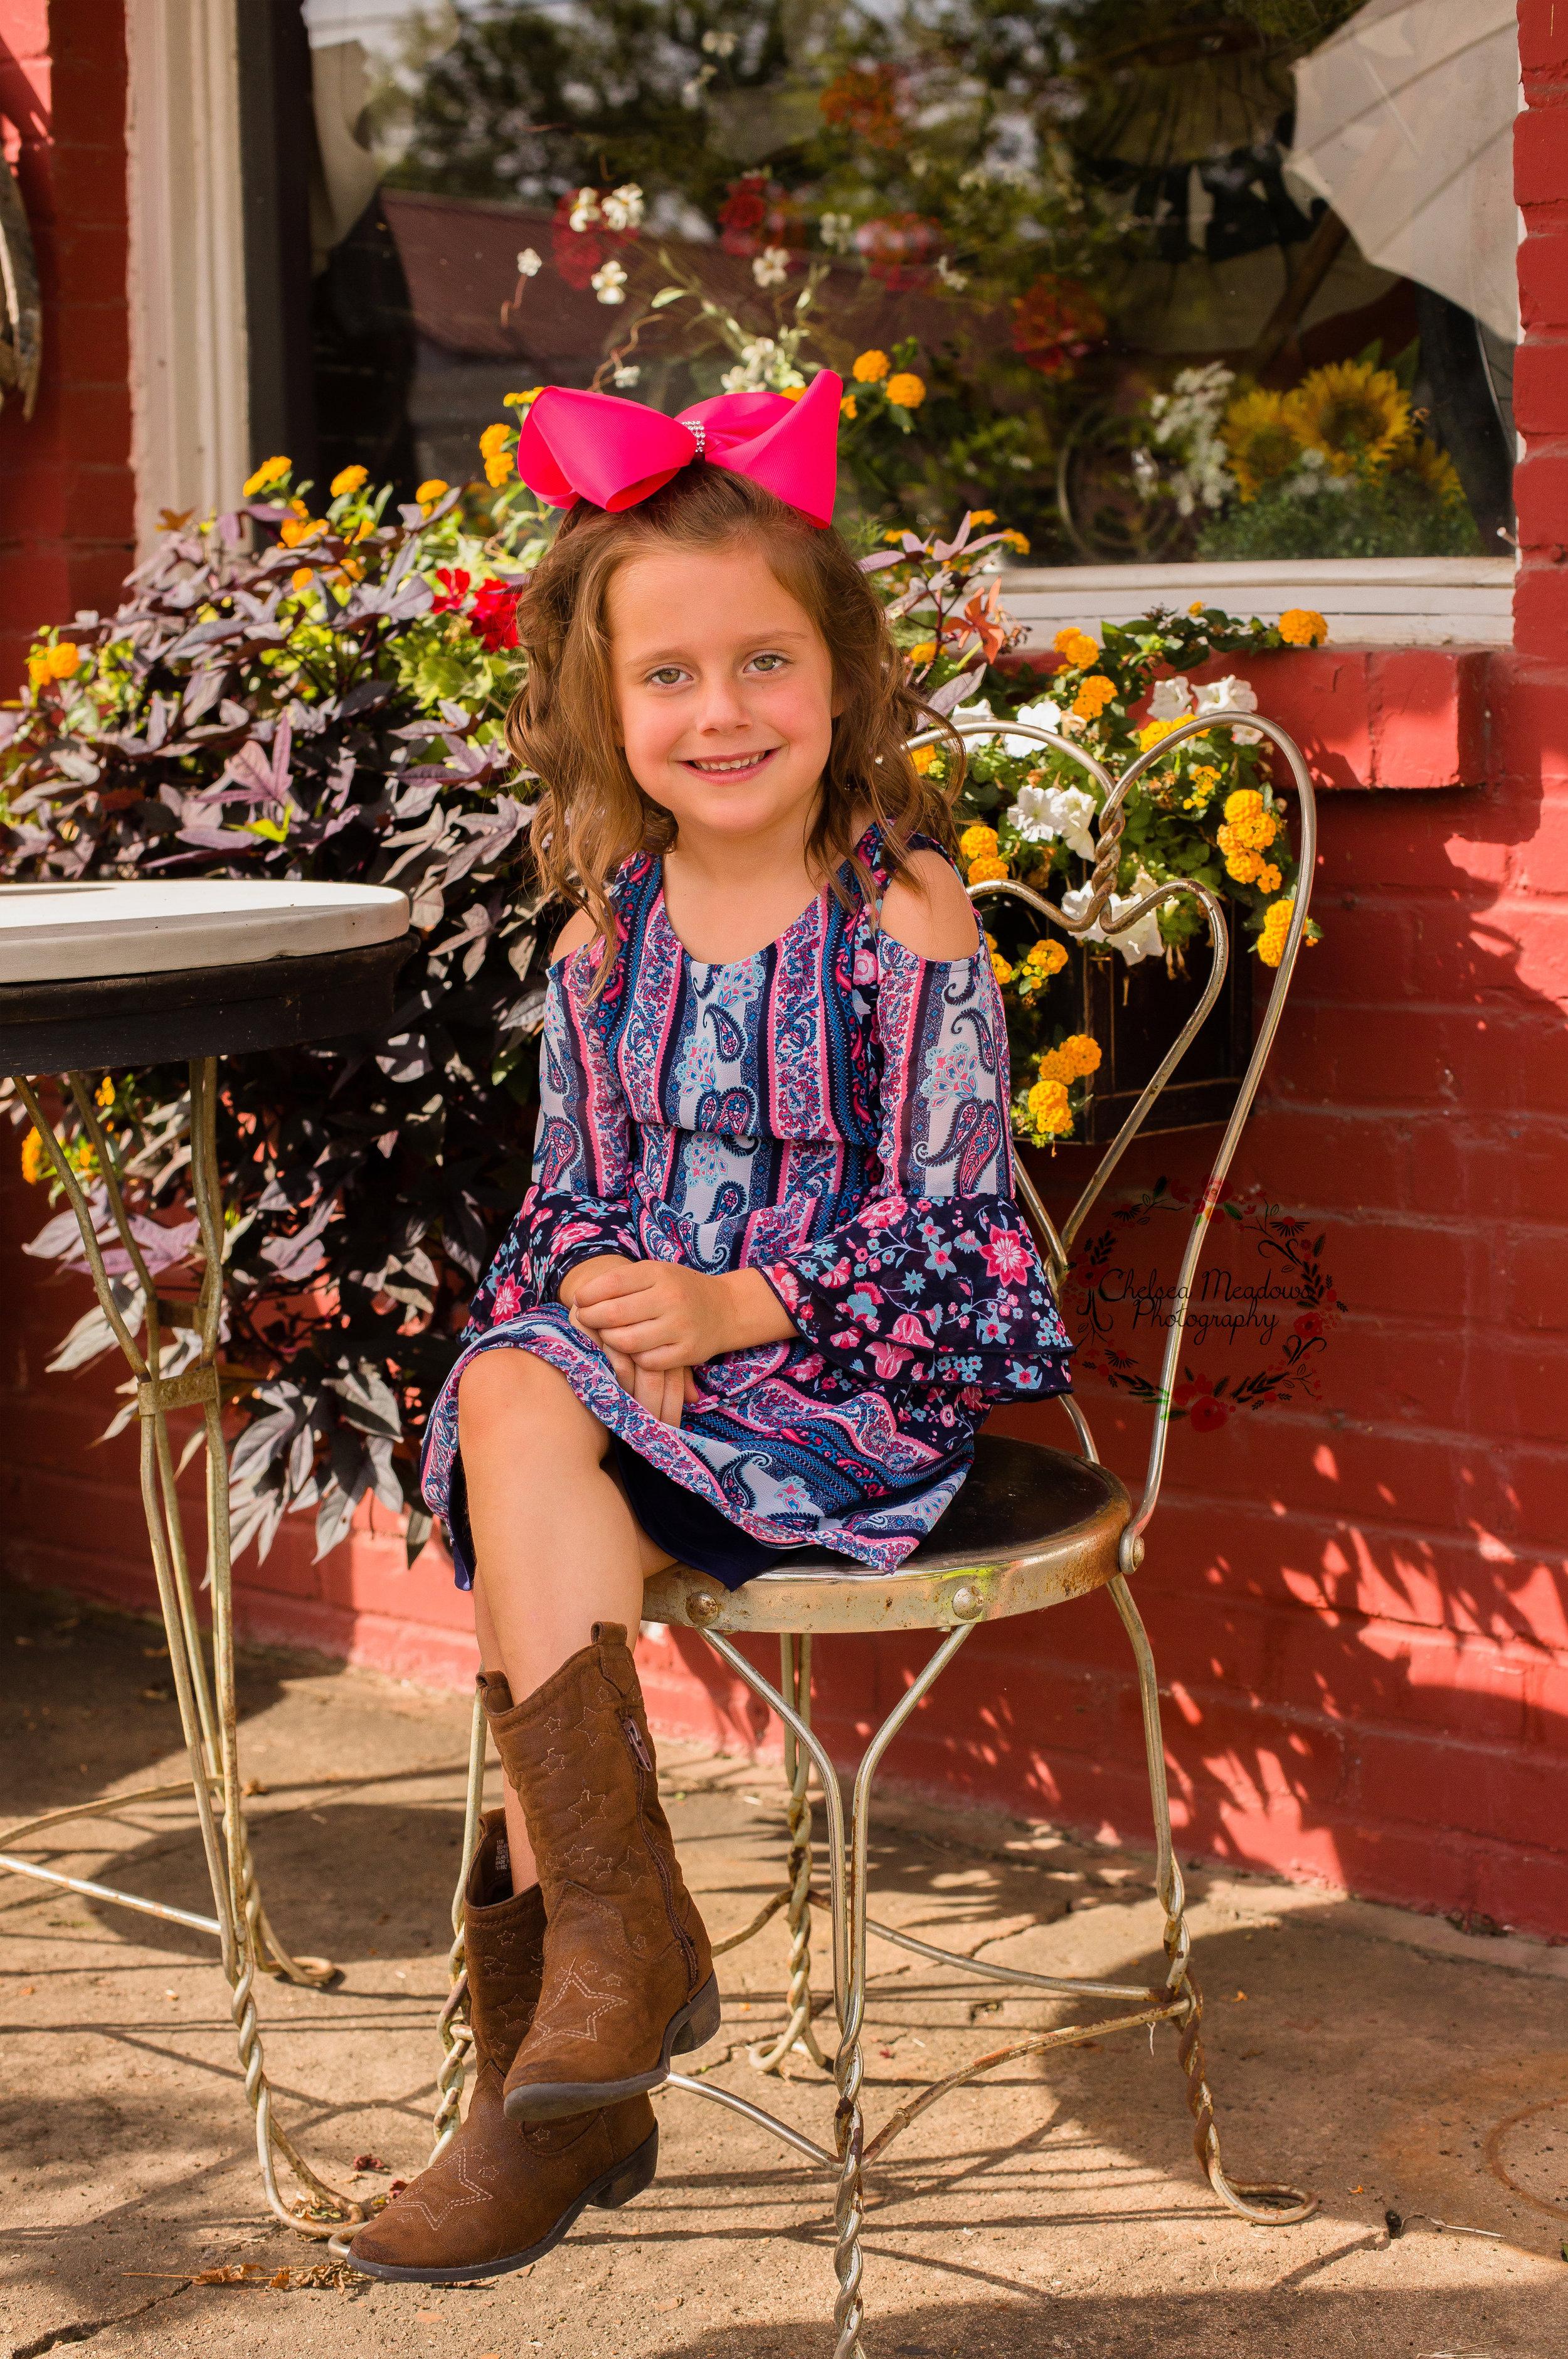 April 6th Birthday - Nashville Family Photographer - Chelsea Meadows Photography (28).jpg